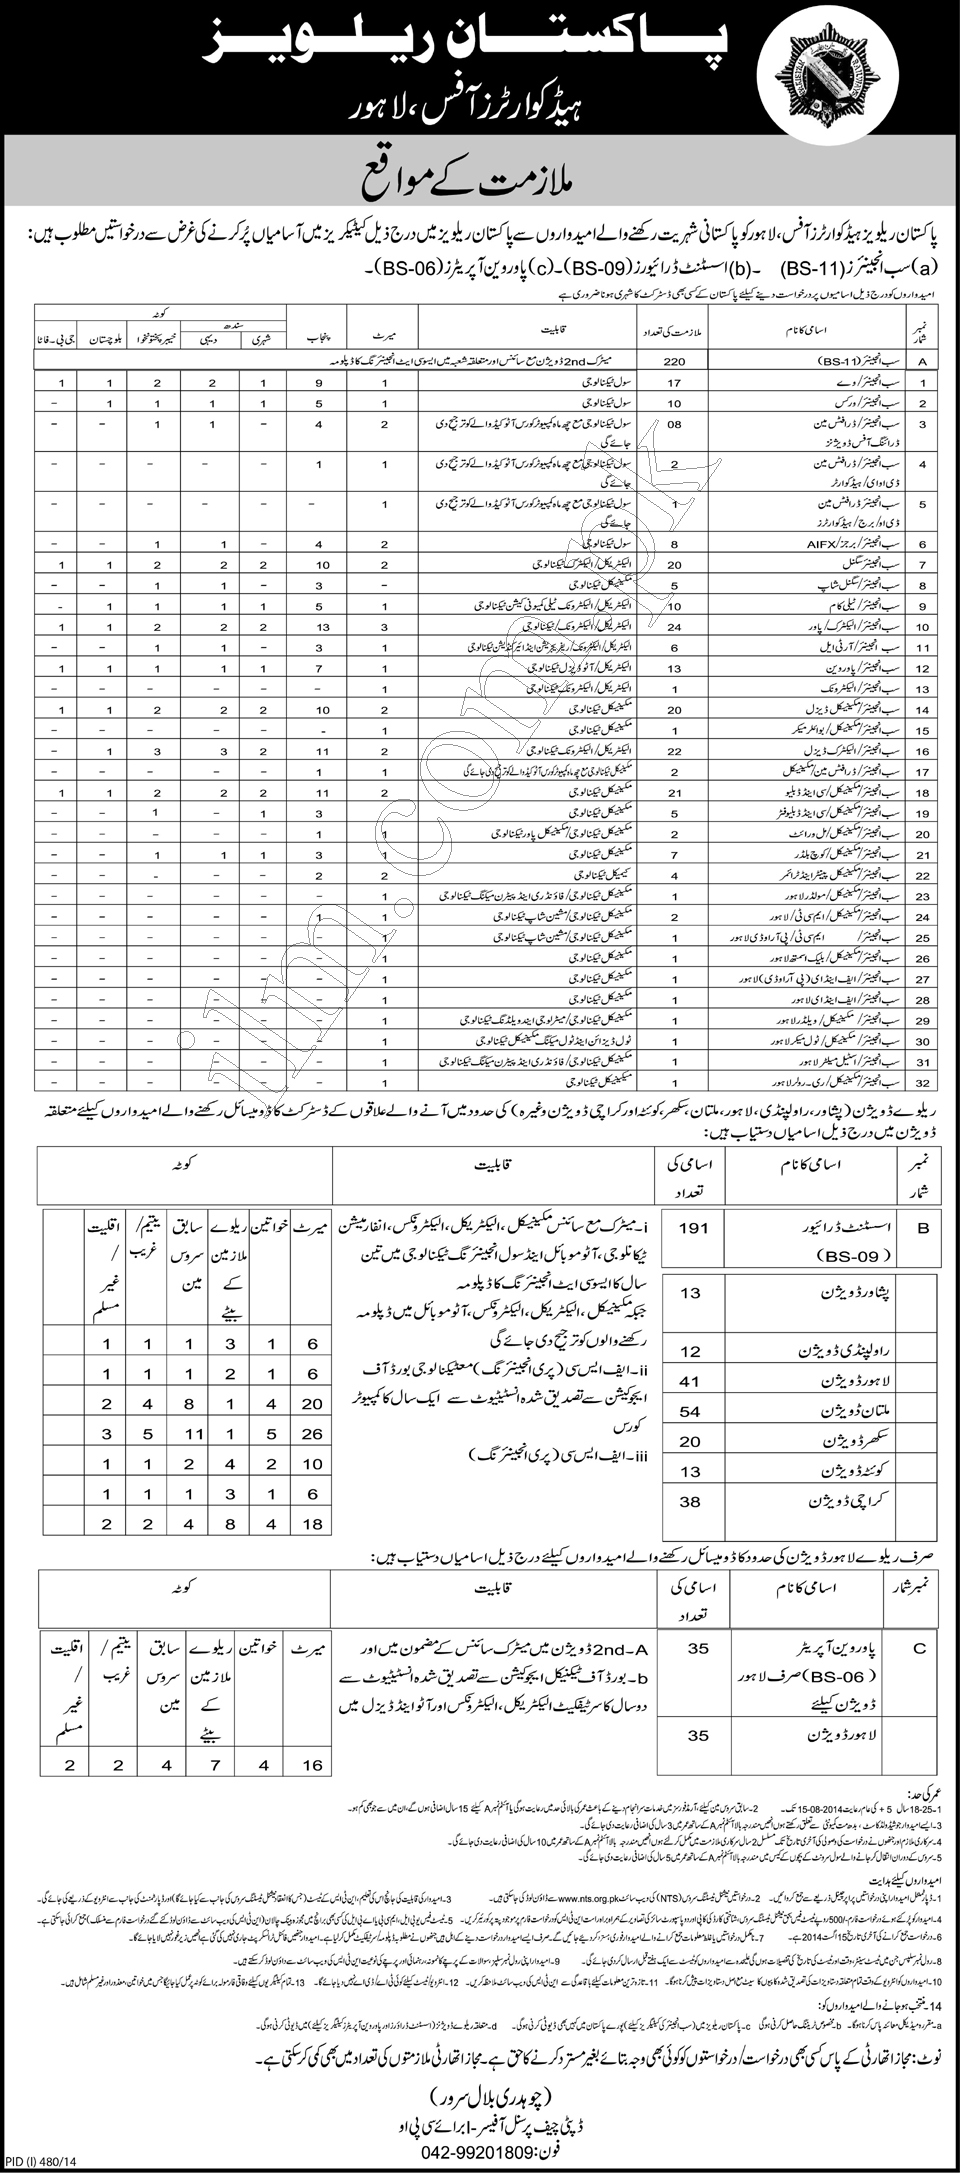 Pakistan Railways Sub Engineers, Assistant Driver Jobs